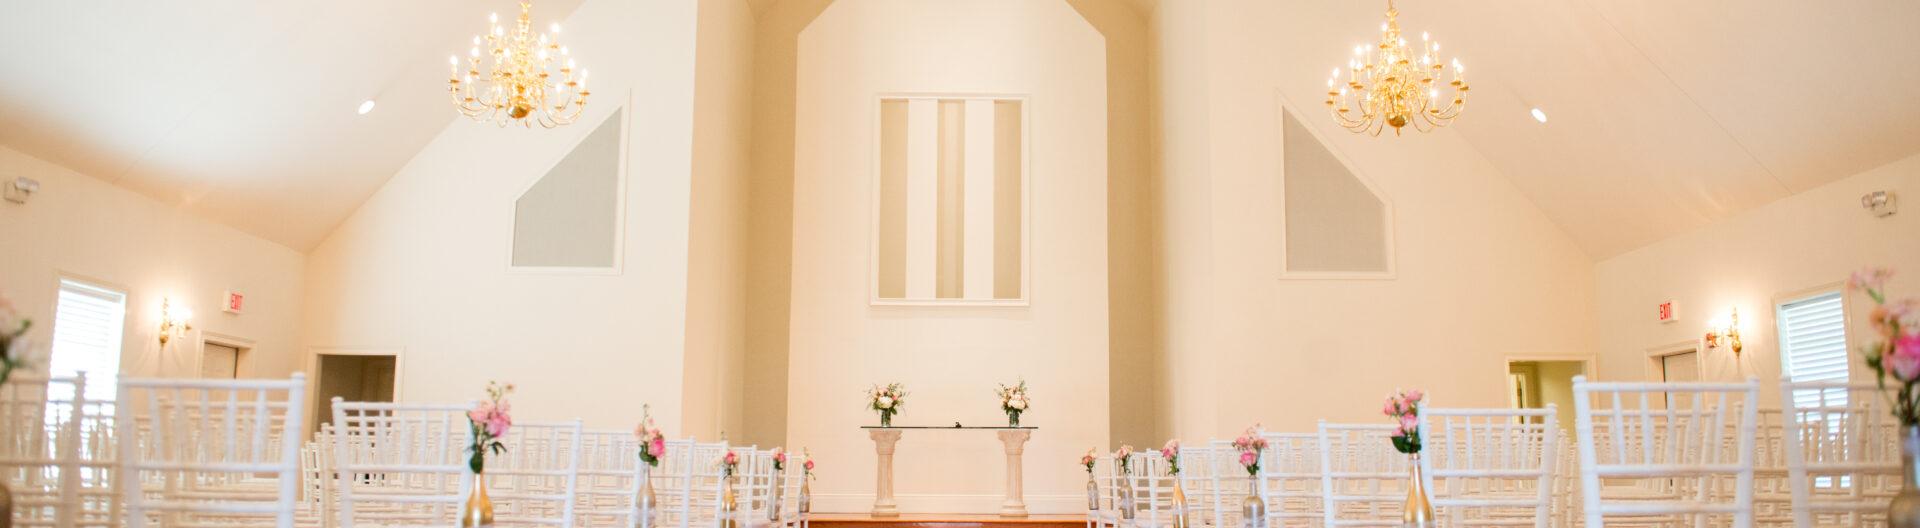 Ritz Charles Chapel Setup